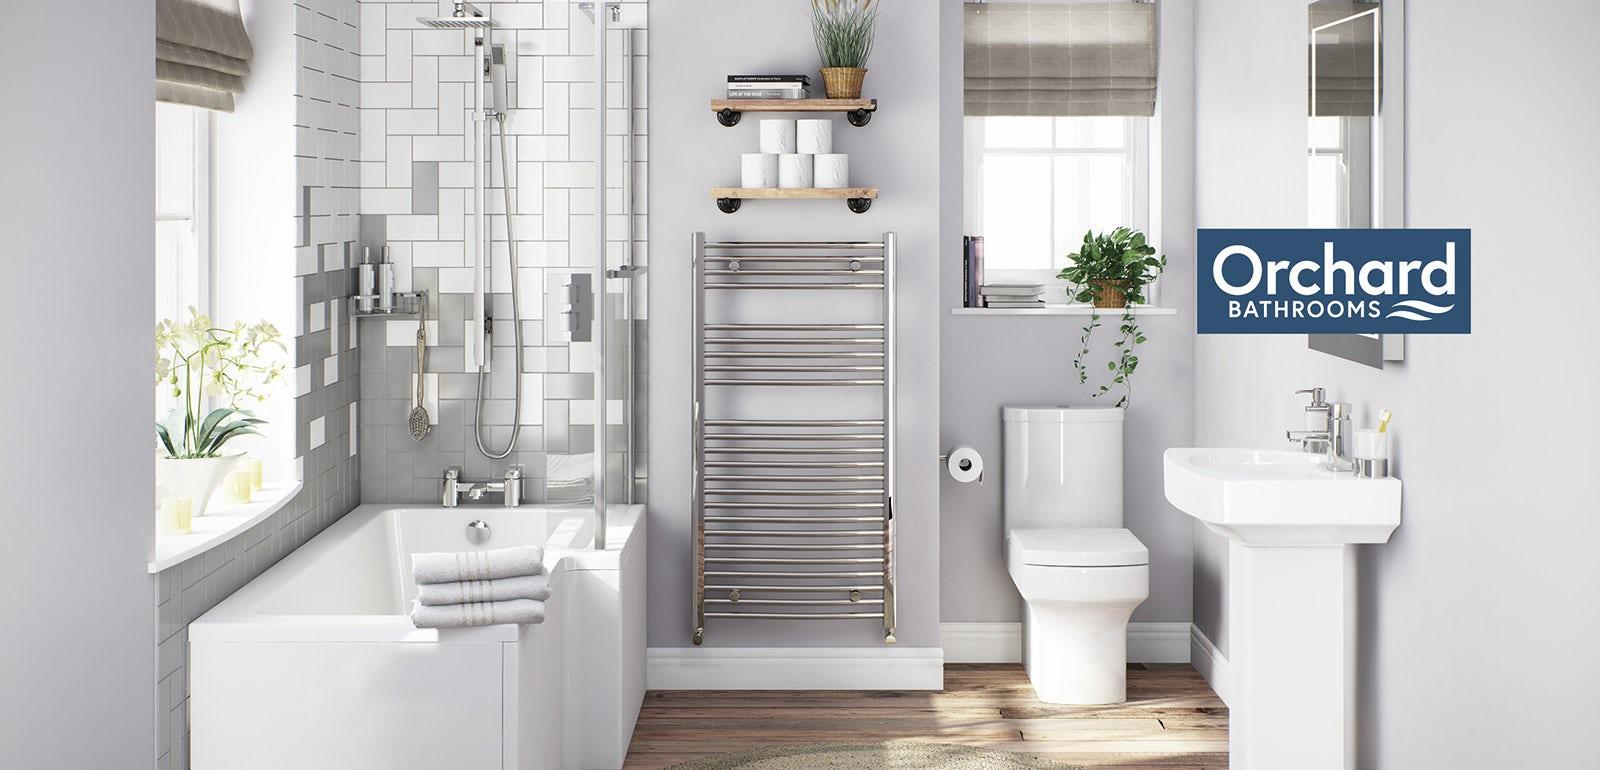 Captivating 50 small bathroom suites inspiration of small bathroom suites space saving bathroom - Small bathroom suites for small spaces collection ...